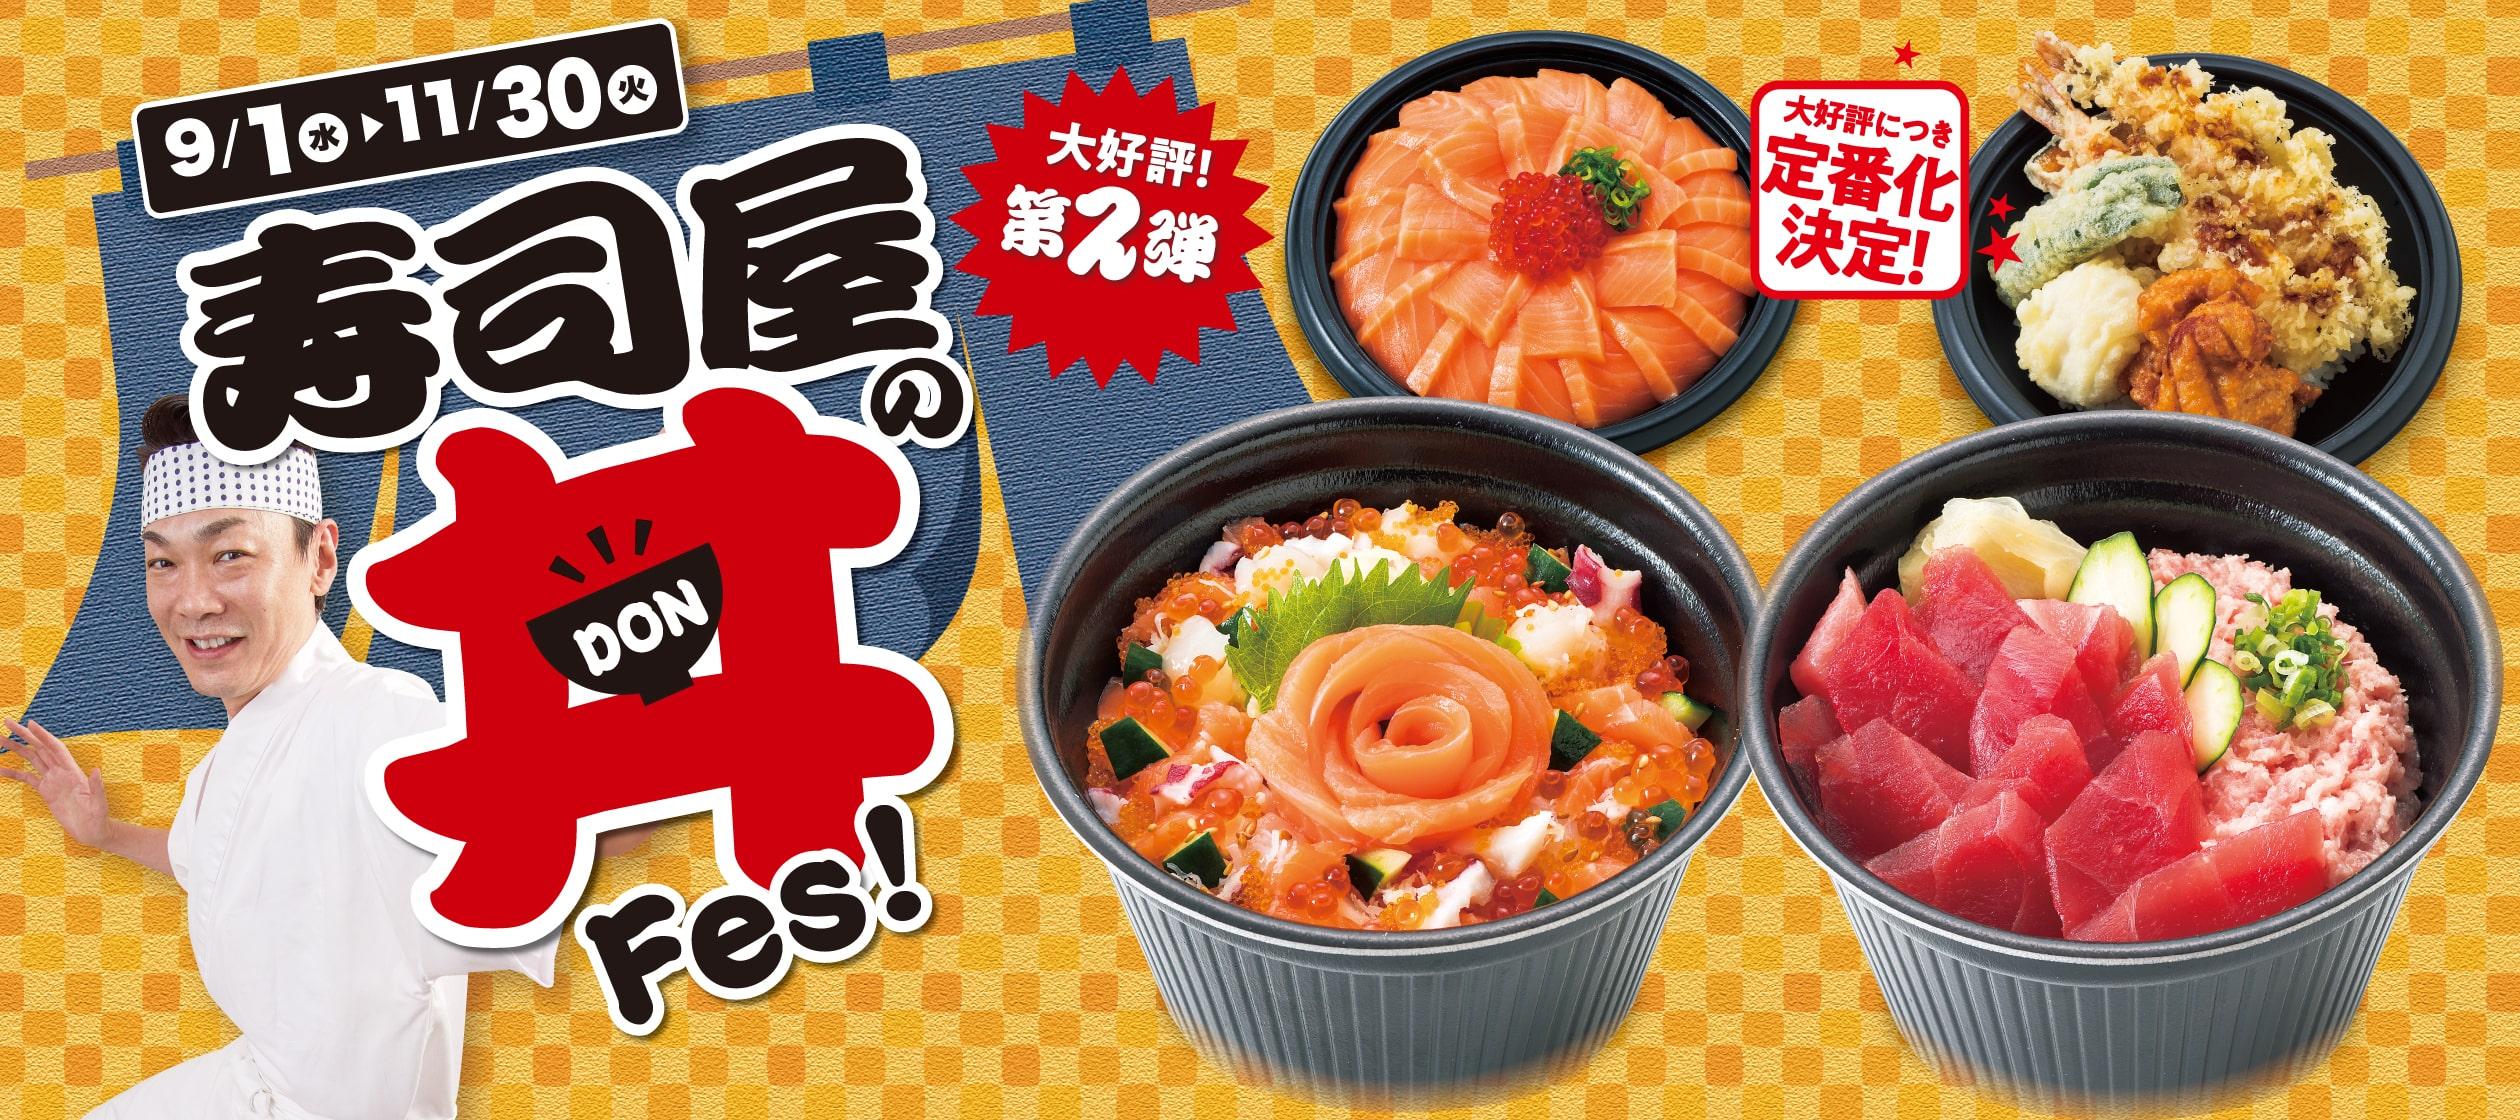 【期間限定】寿司屋の丼フェス 第2弾(販売期間:9月1日~11月30日)